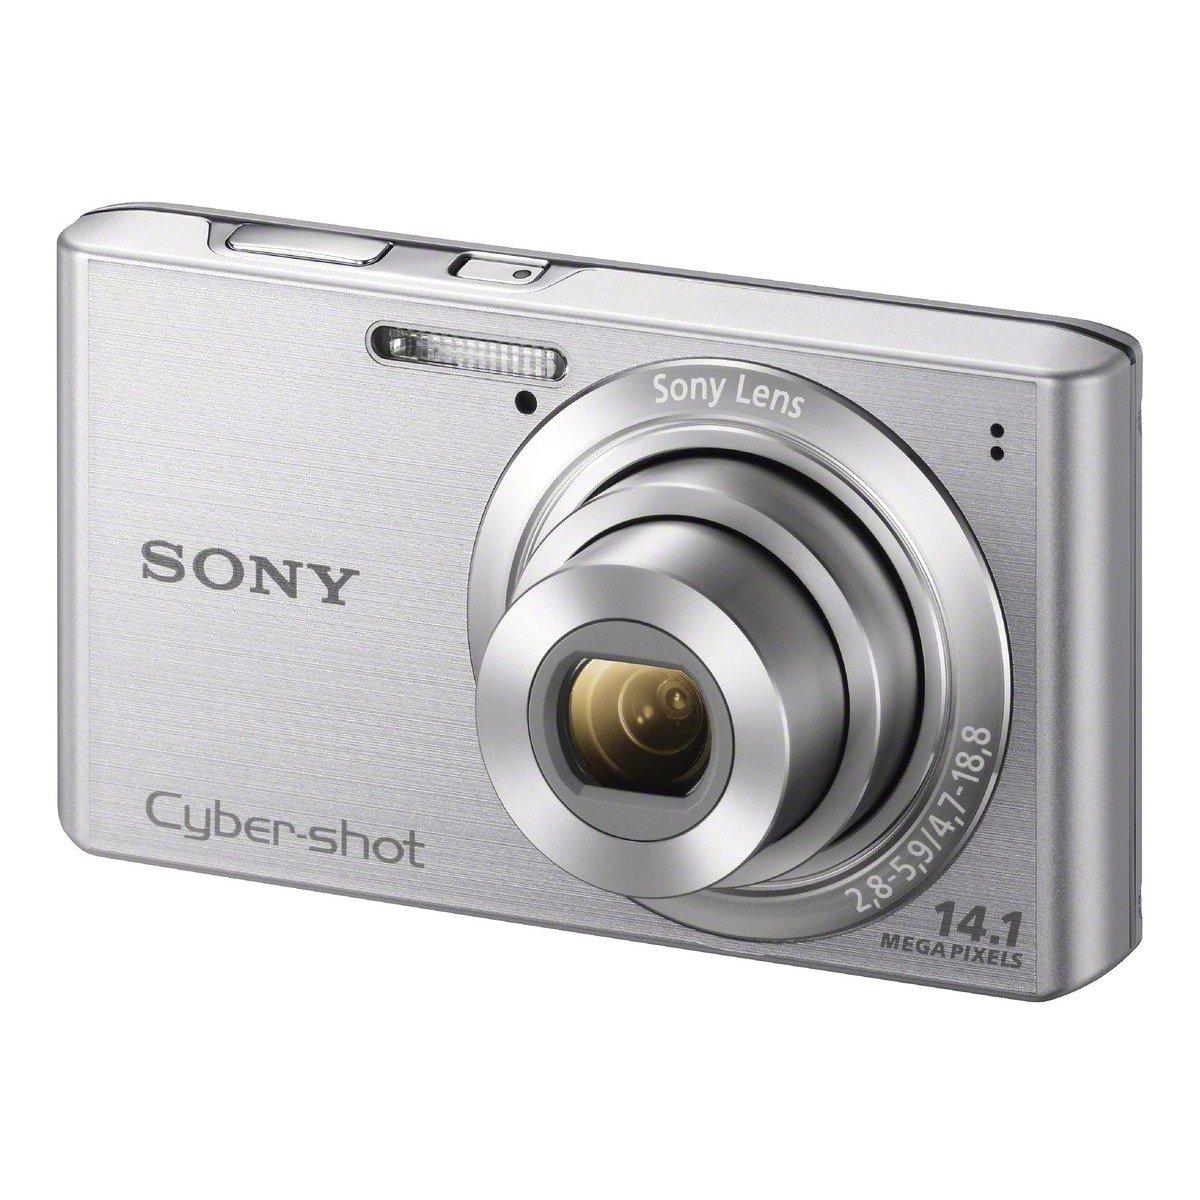 https://thetechjournal.com/wp-content/uploads/images/1201/1326861340-sony-cybershot-dscw610-141-mp-digital-camera-2.jpg